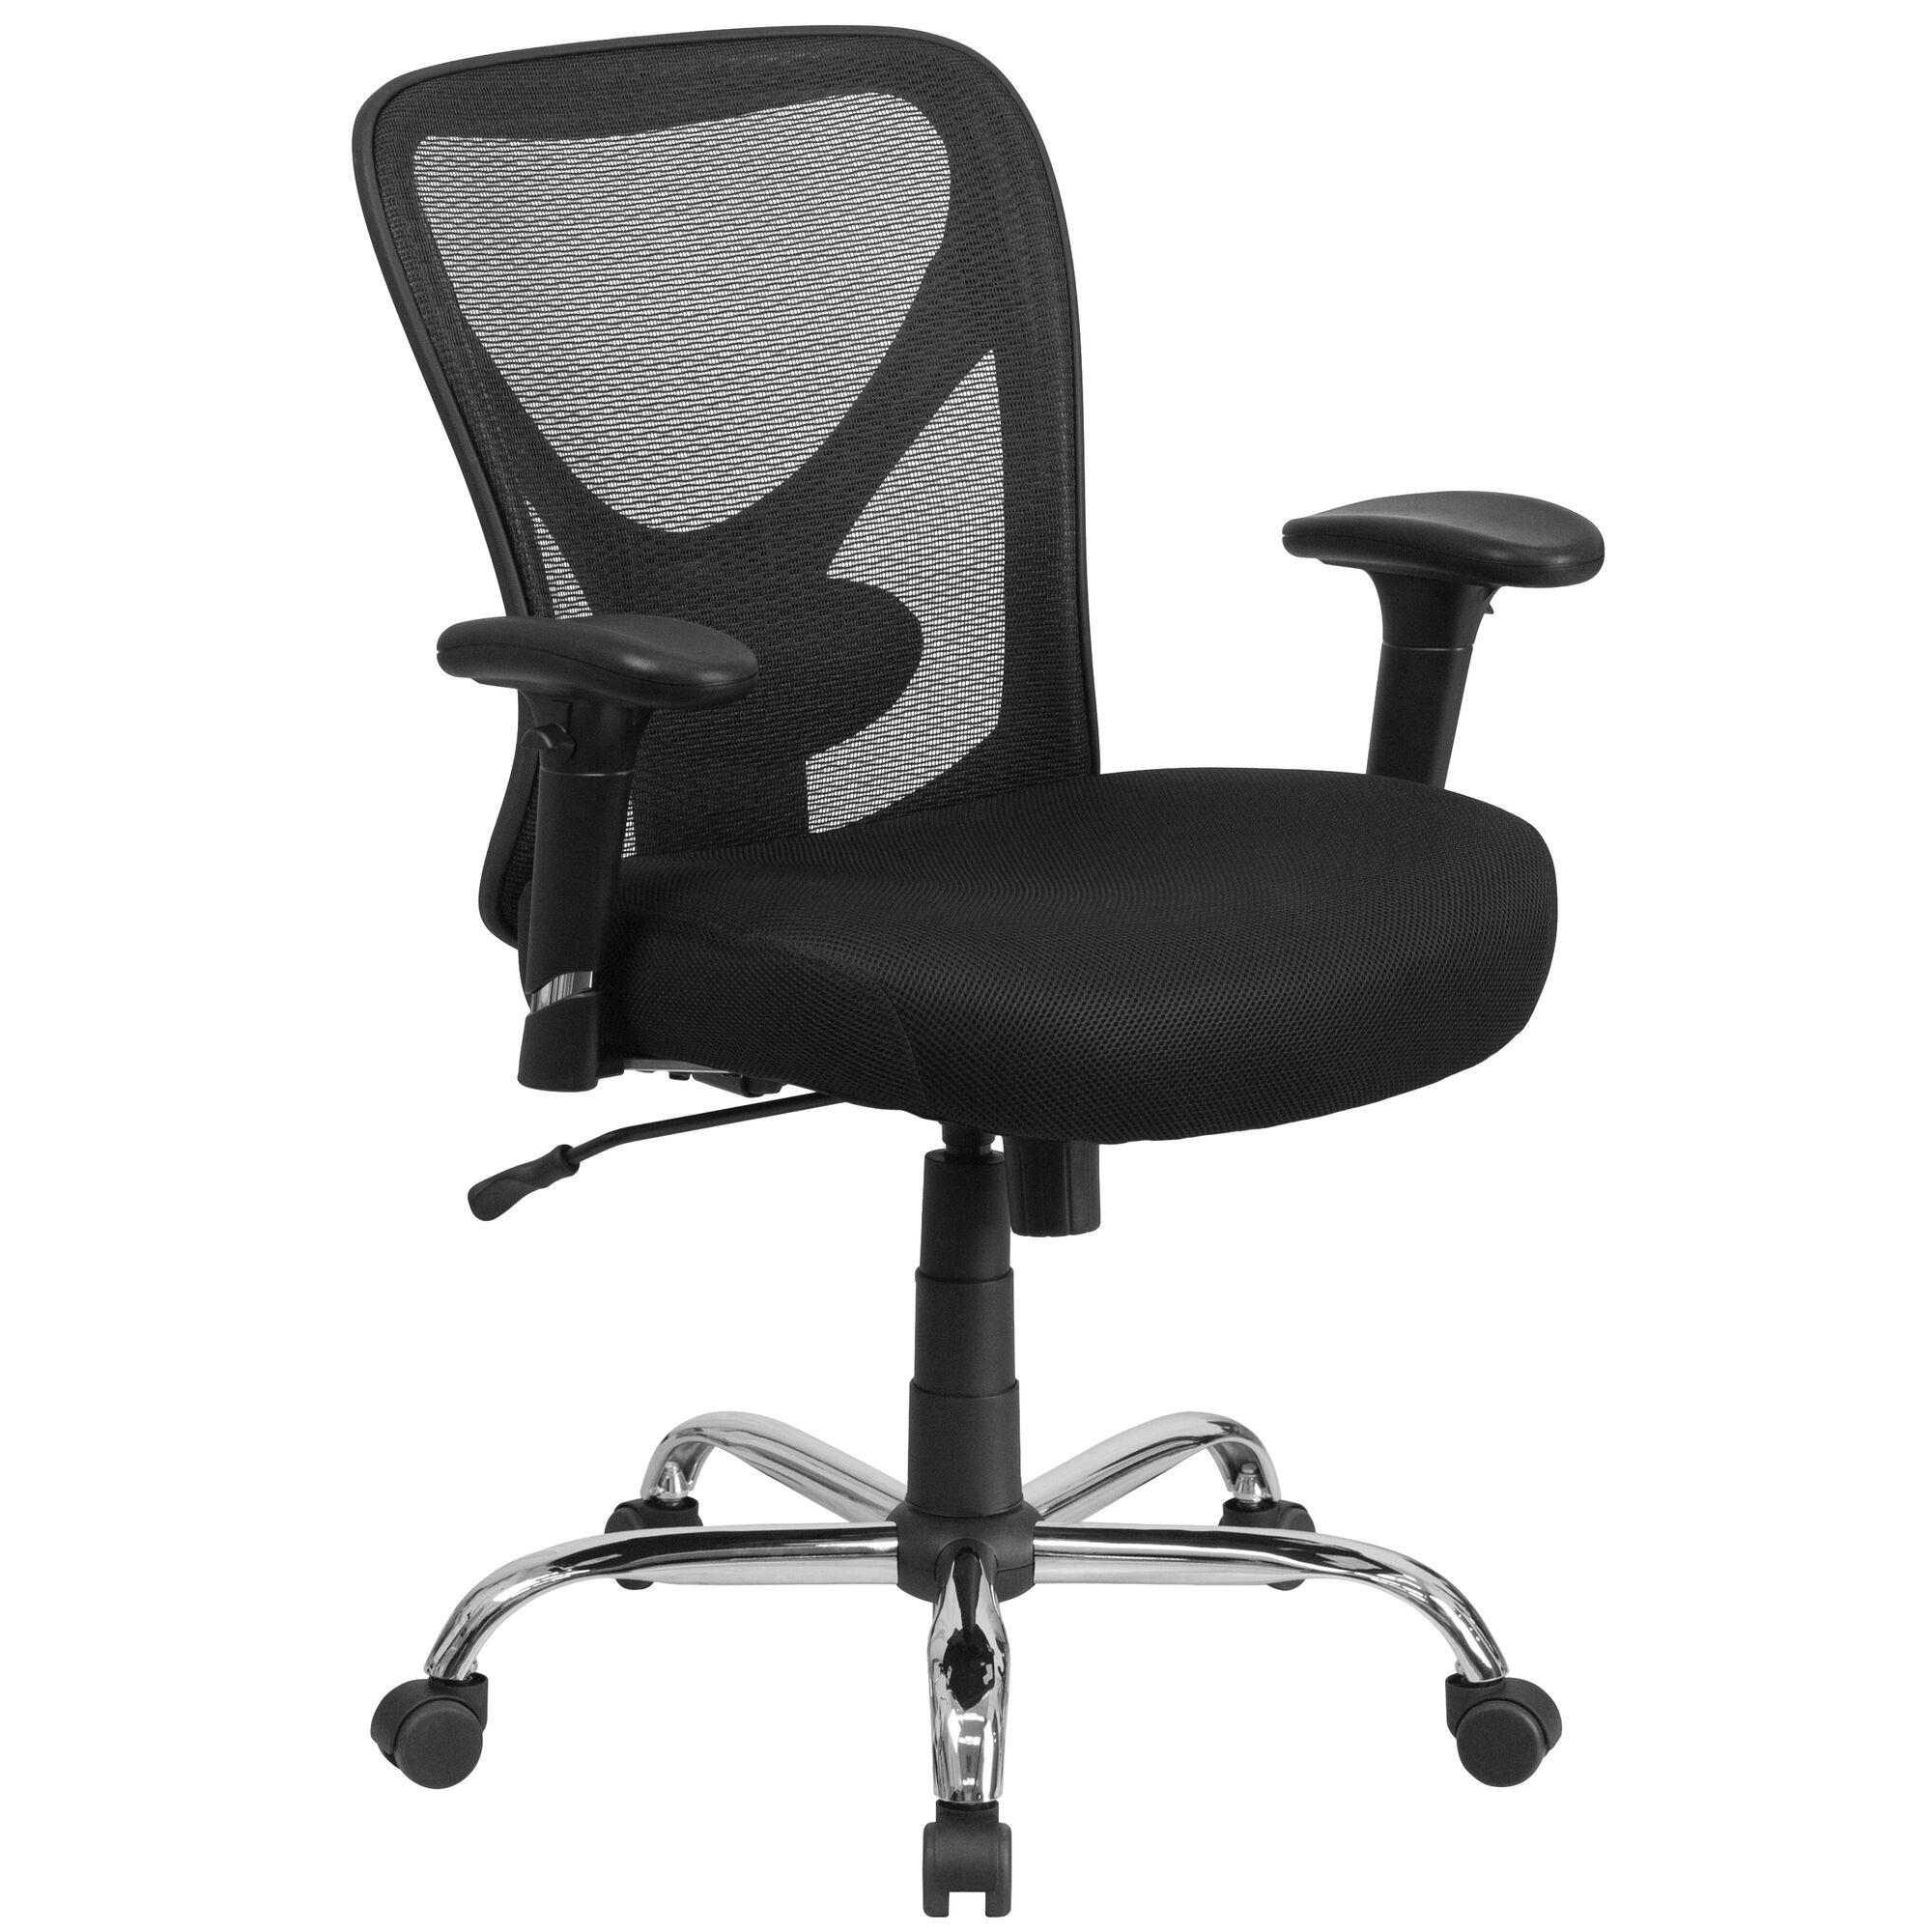 Swell Big Tall Office Desk Chairs Heavy Duty Bizchair Com Home Interior And Landscaping Palasignezvosmurscom